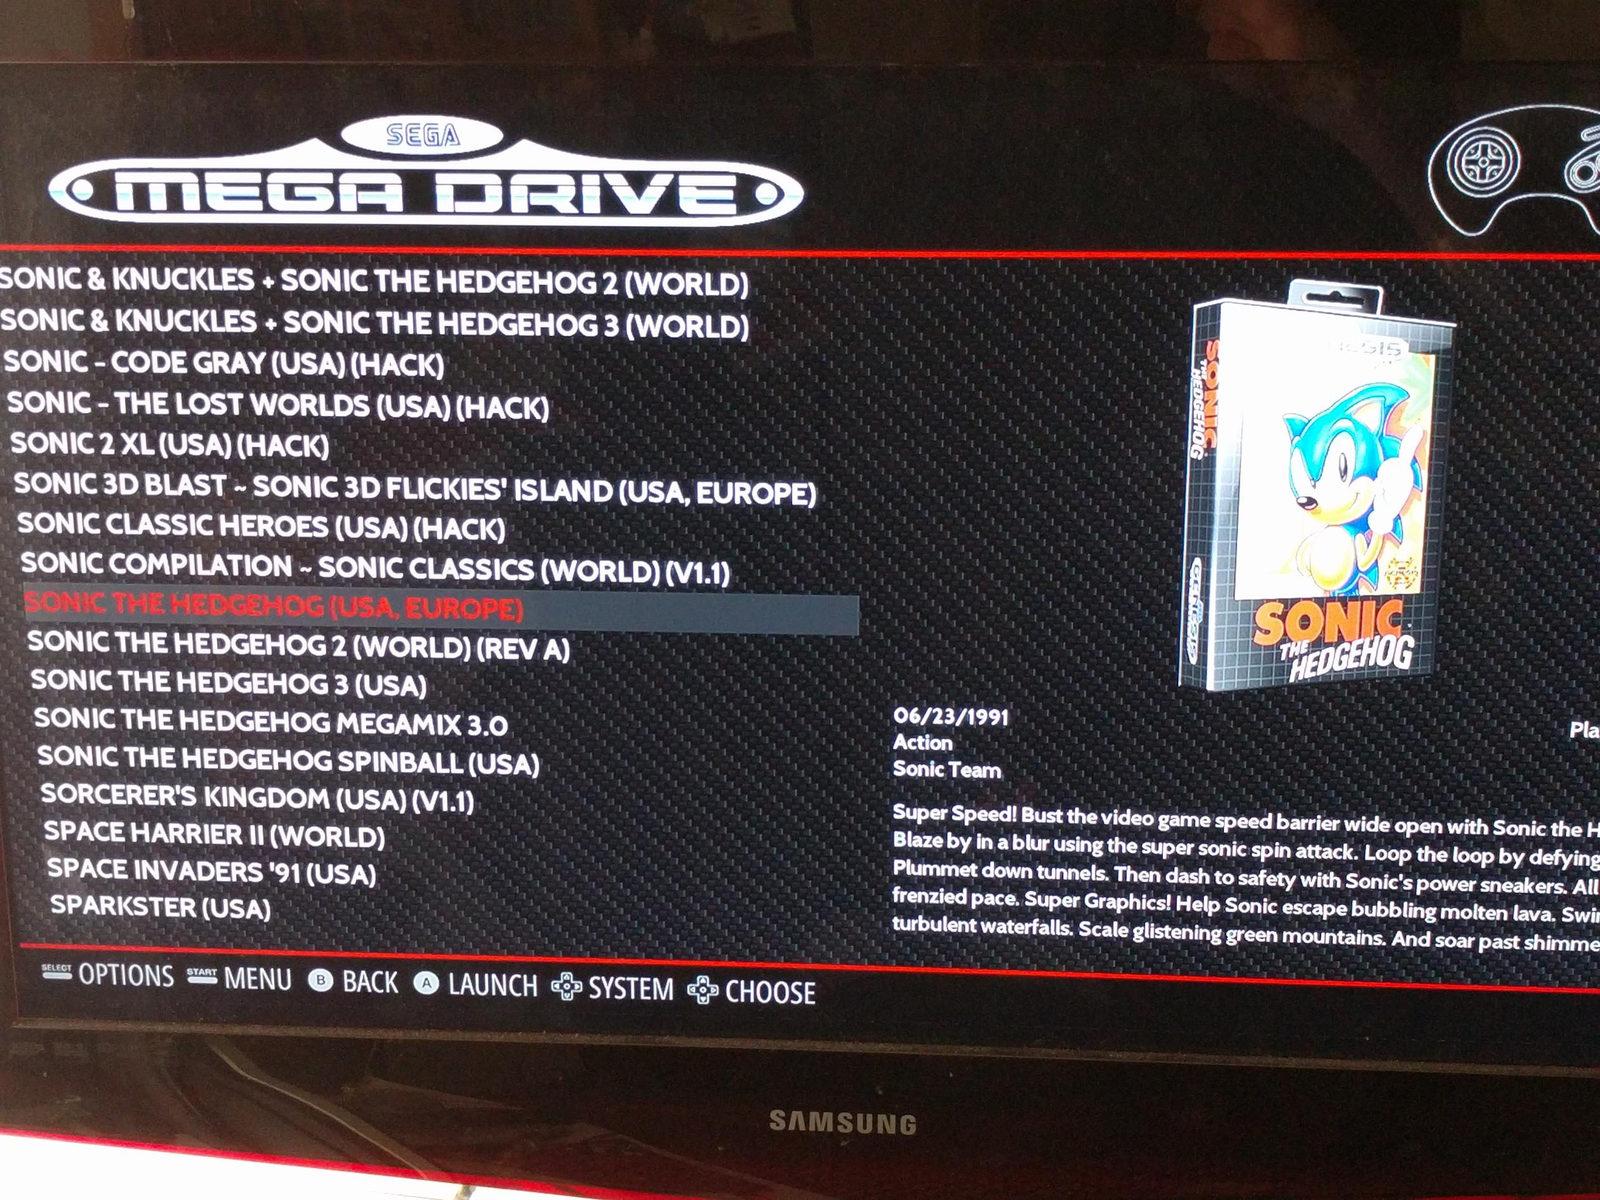 Mini NES-Retroflag NESPi Raspberry Pi 3 Classic Game Console 64GB w/ Controller.